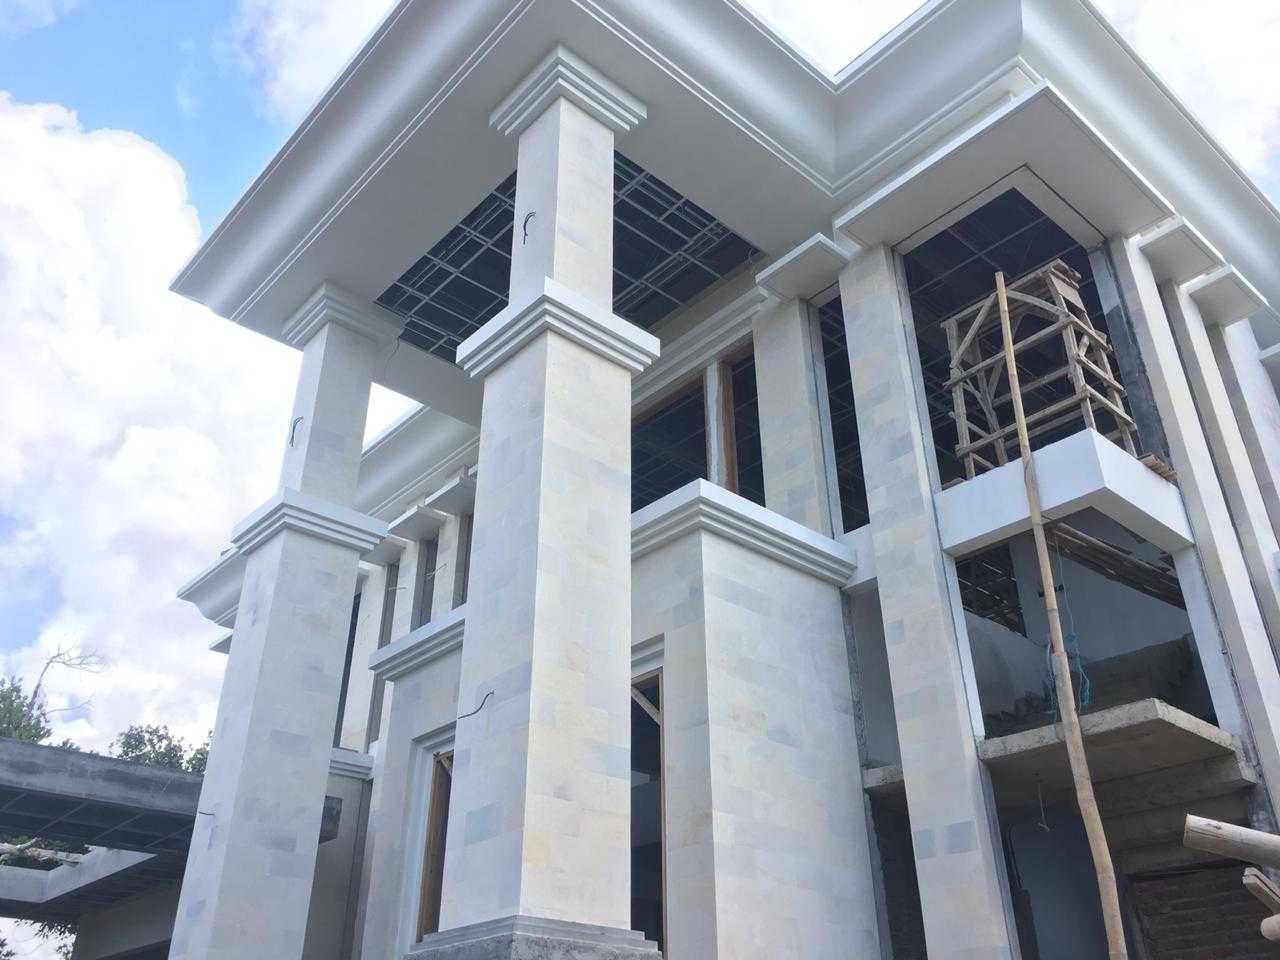 Emporio Architect In Progress Villa Bali Tropis 216  @ Denpasar Kota Denpasar, Bali, Indonesia Kota Denpasar, Bali, Indonesia Emporio-Architect-Progress-Villa-Bali-Tropis-216-Denpasar  75652